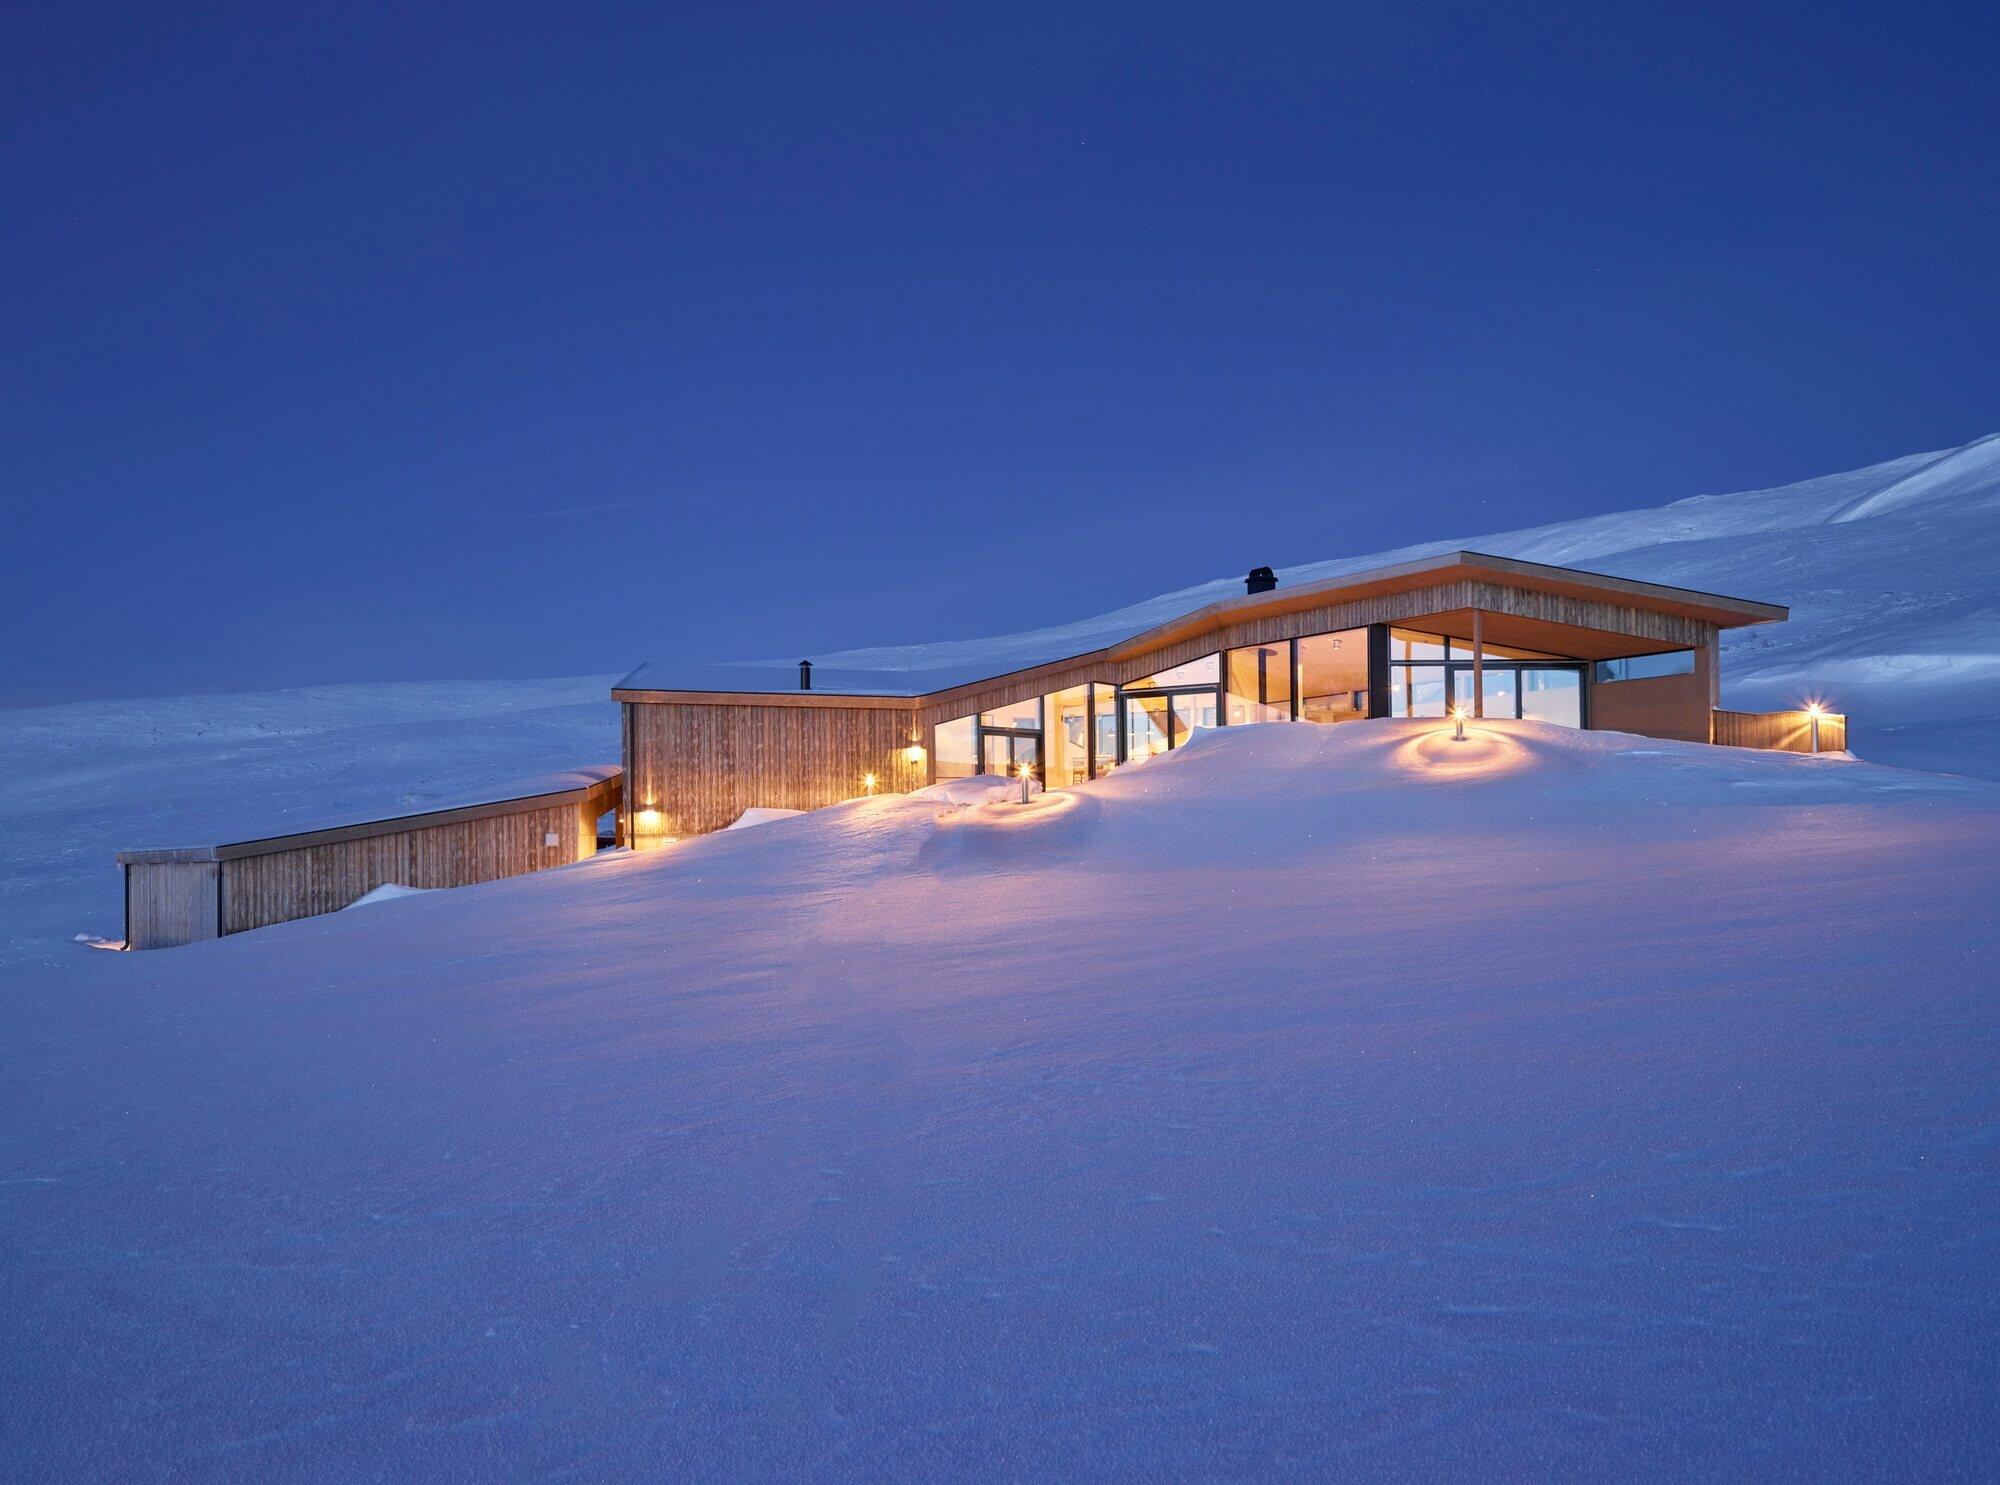 Gubrandslie-Cabin-Helen-&-Hard-architects-Norway-8